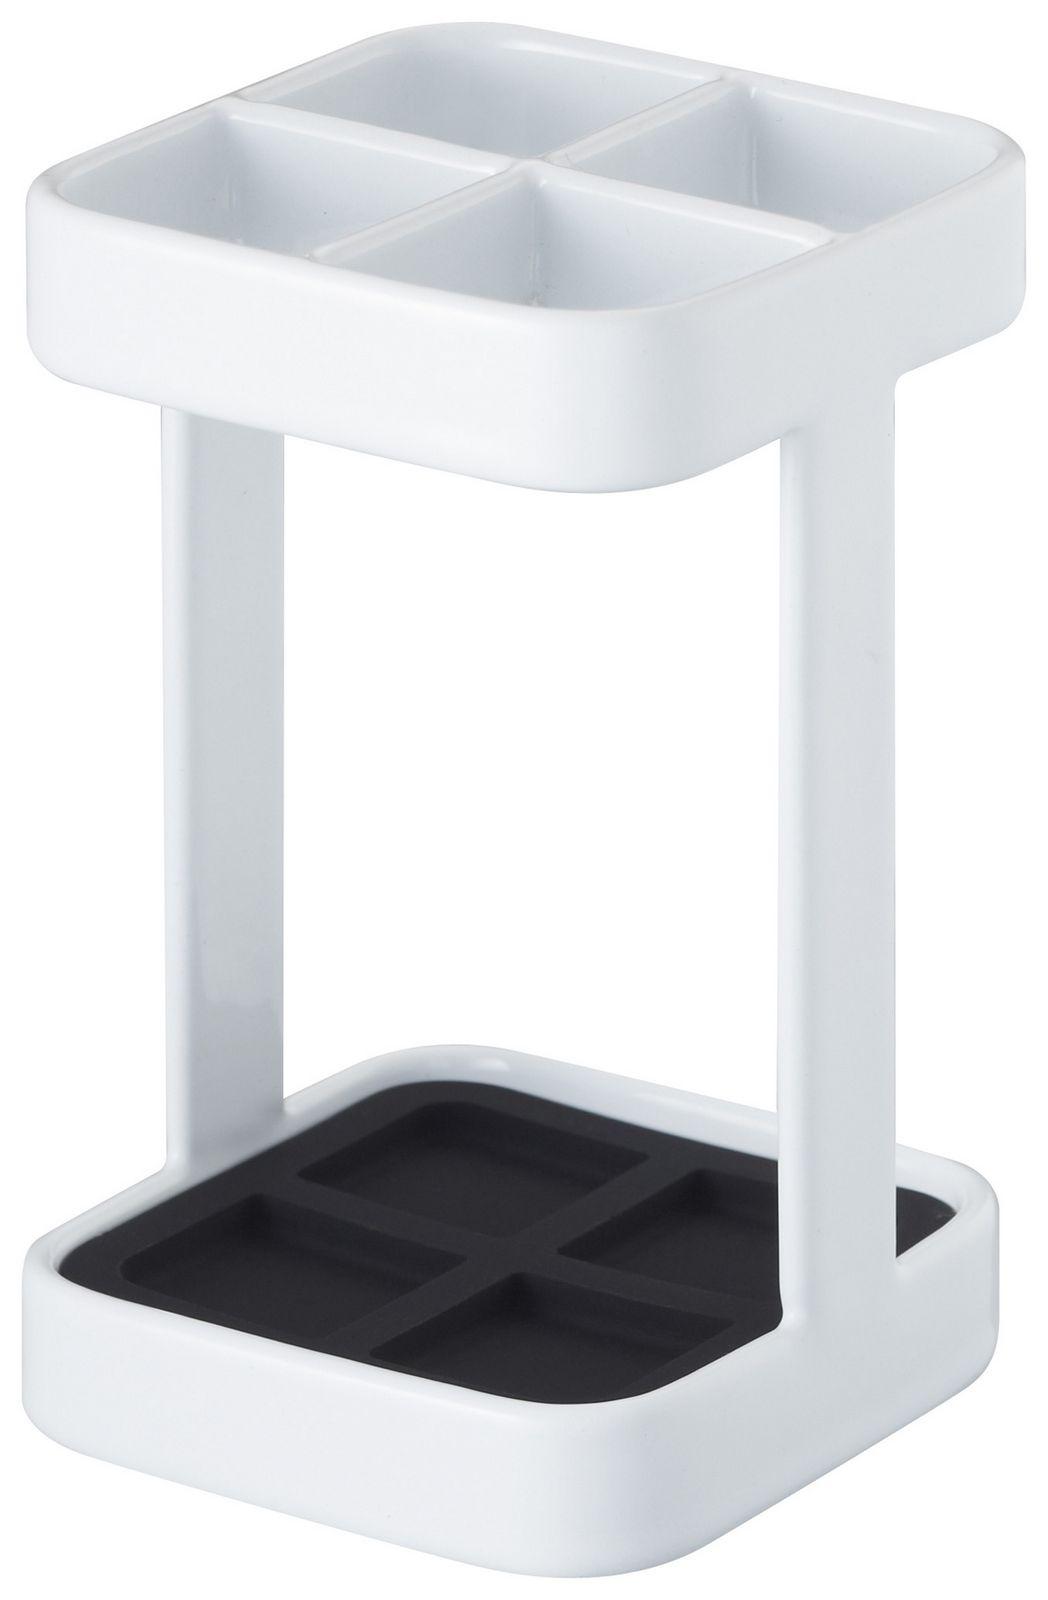 Стакан для ванной комнаты Yamazaki 2821